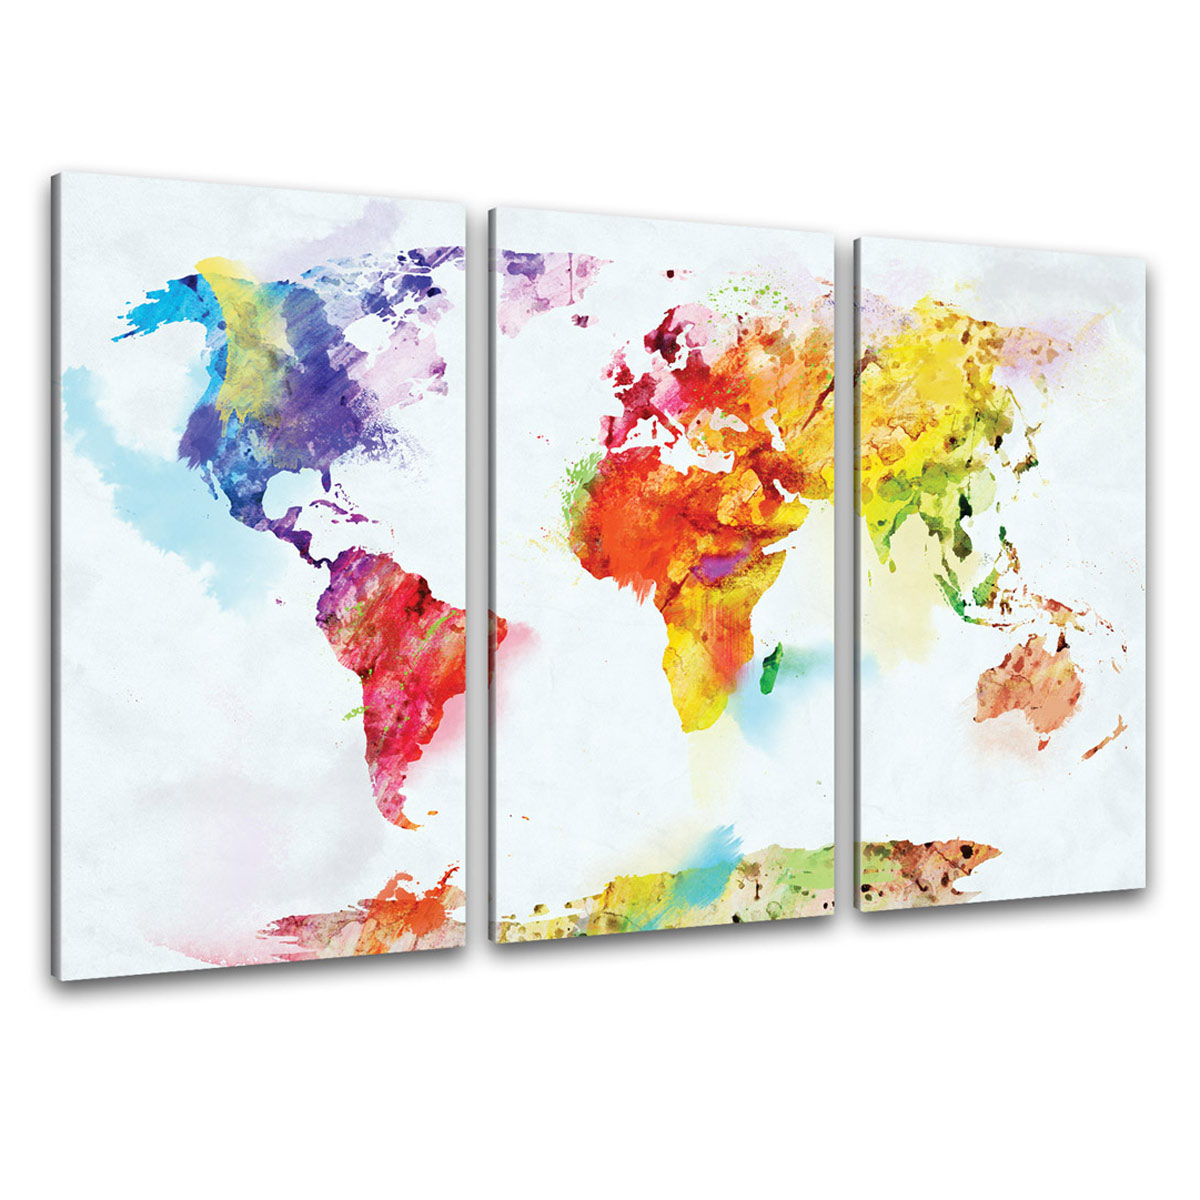 kunstdruck 3 teilige leinwand weltkarte aquarell wanddeko wohnen lifestyle gadgets. Black Bedroom Furniture Sets. Home Design Ideas